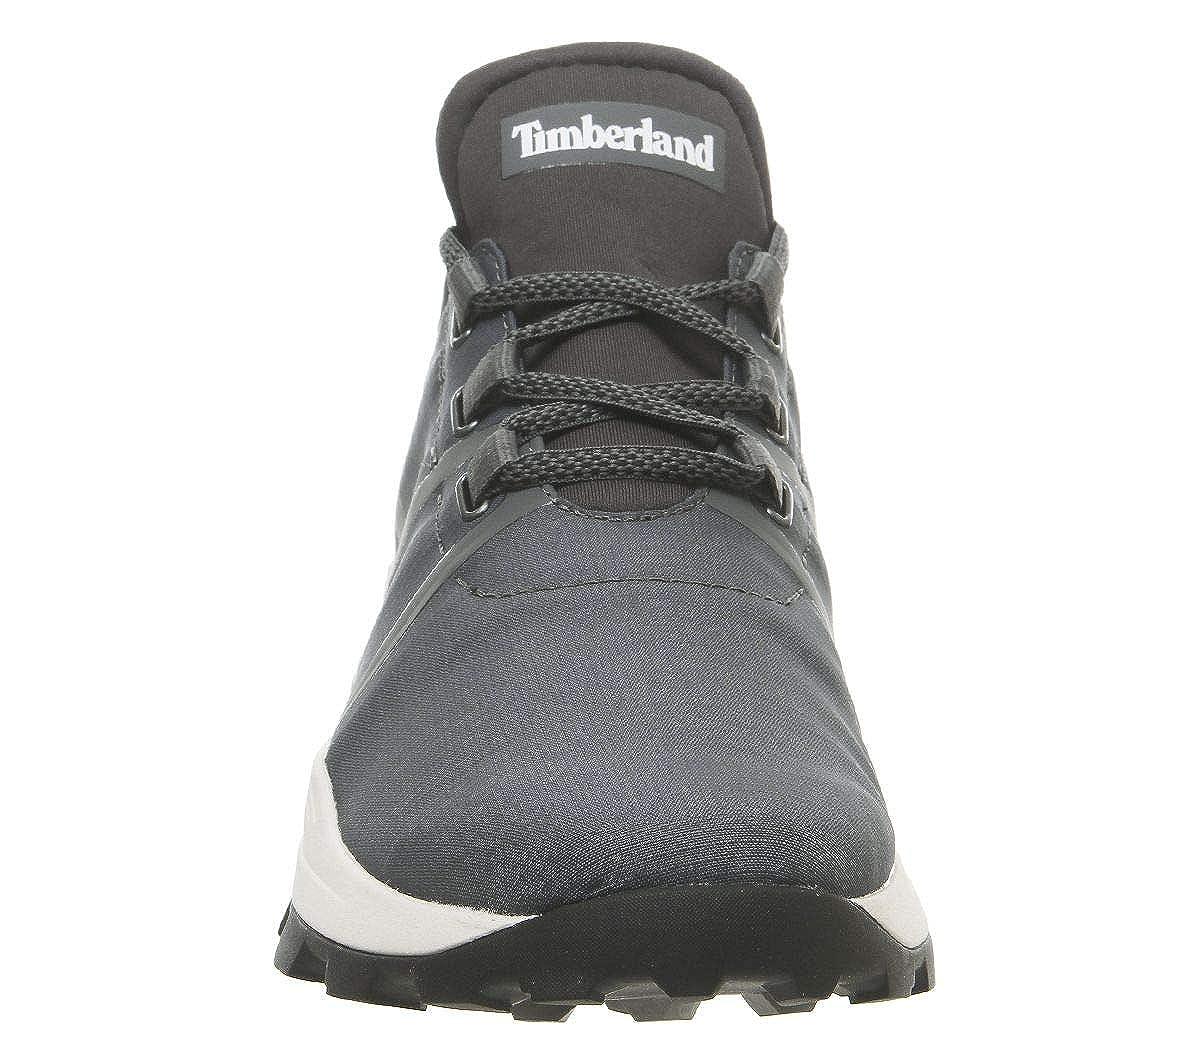 Timberland Brooklyn Fabric Oxford Shoes Men Castlerock 2019